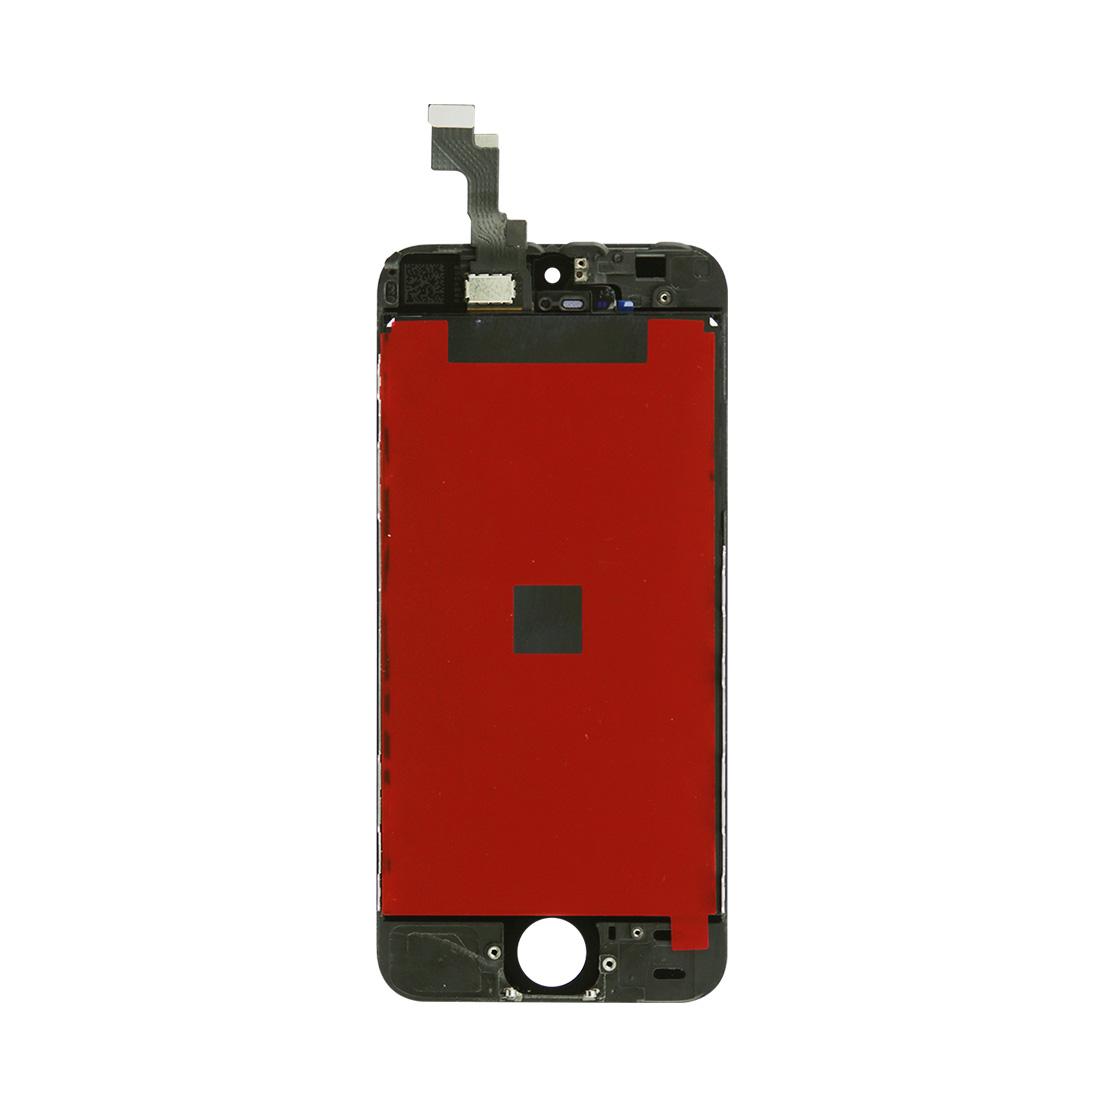 iPhone 5S/SE LCD Assembly - Black (Aftermarket) - MK Mobile